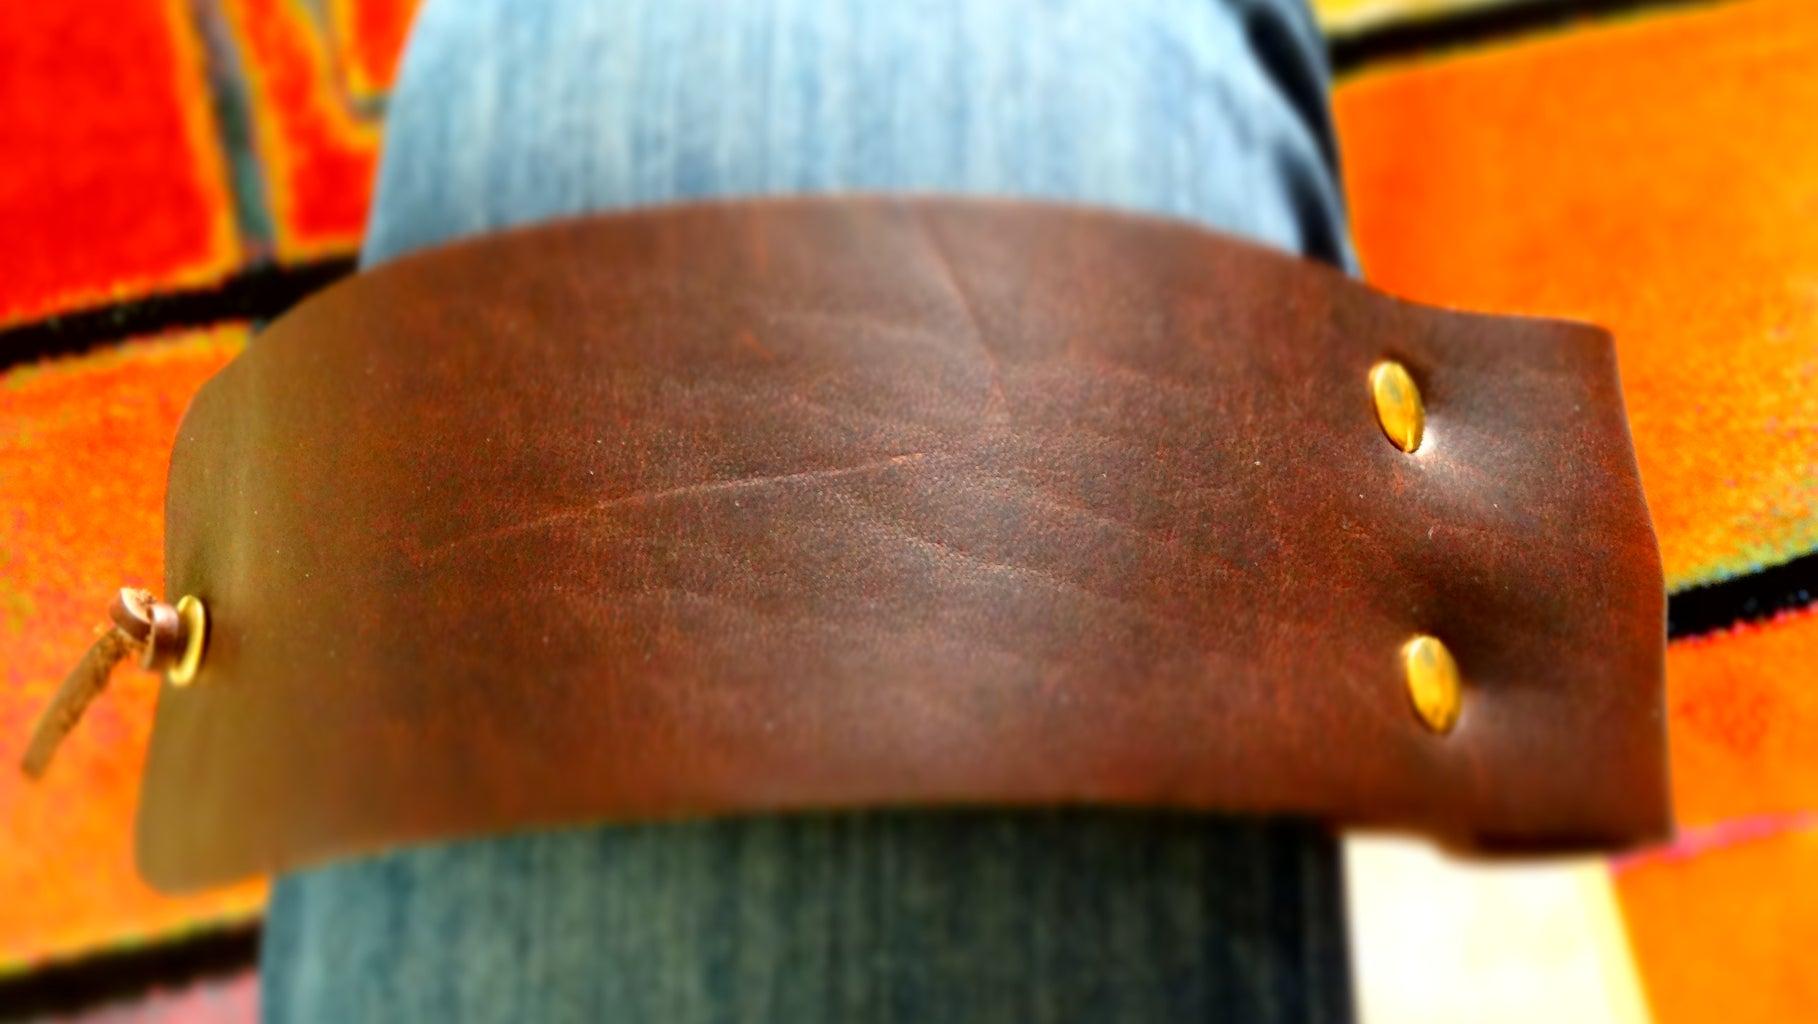 The Leather Knee Pad Cajon Set Up